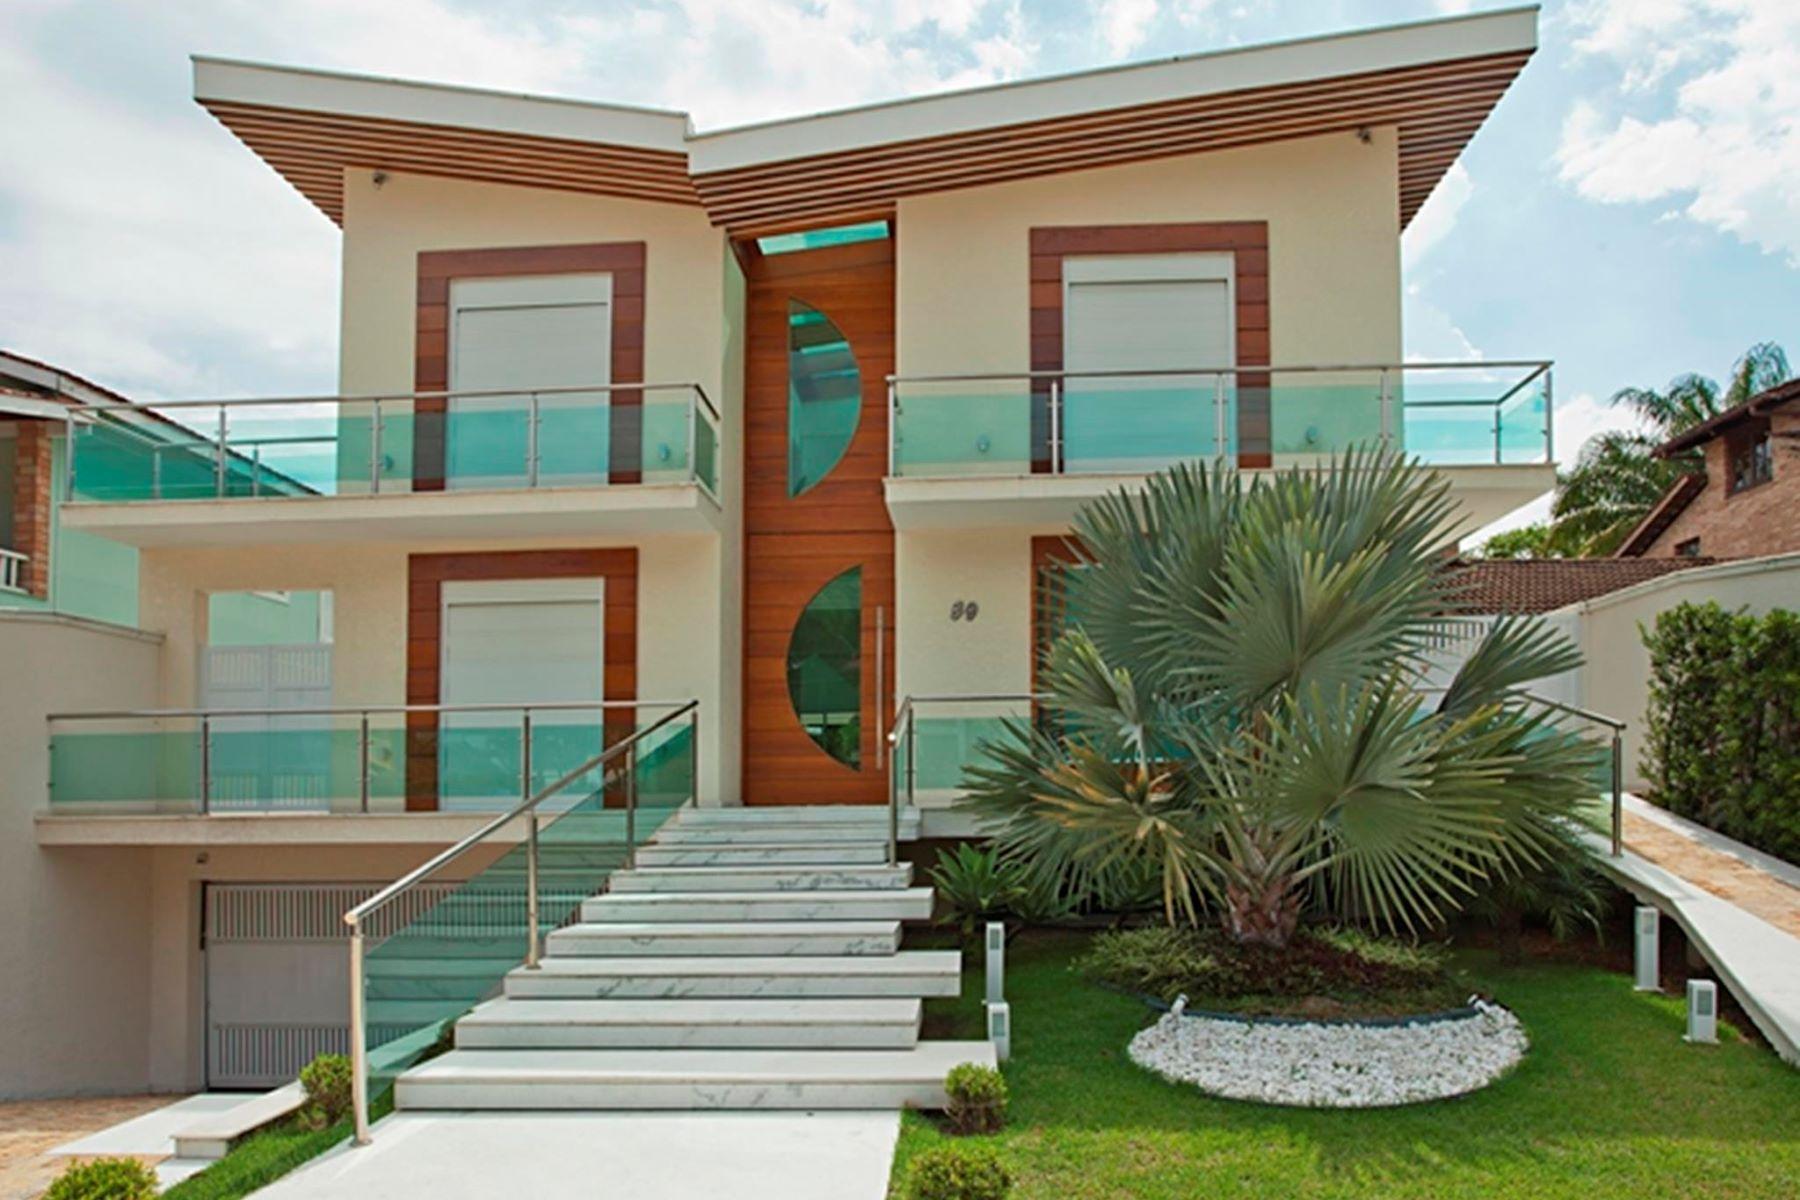 Tek Ailelik Ev için Satış at Full Leisure Area Rua Passeio Manauara Bertioga, Sao Paulo, 11250-000 Brezilya